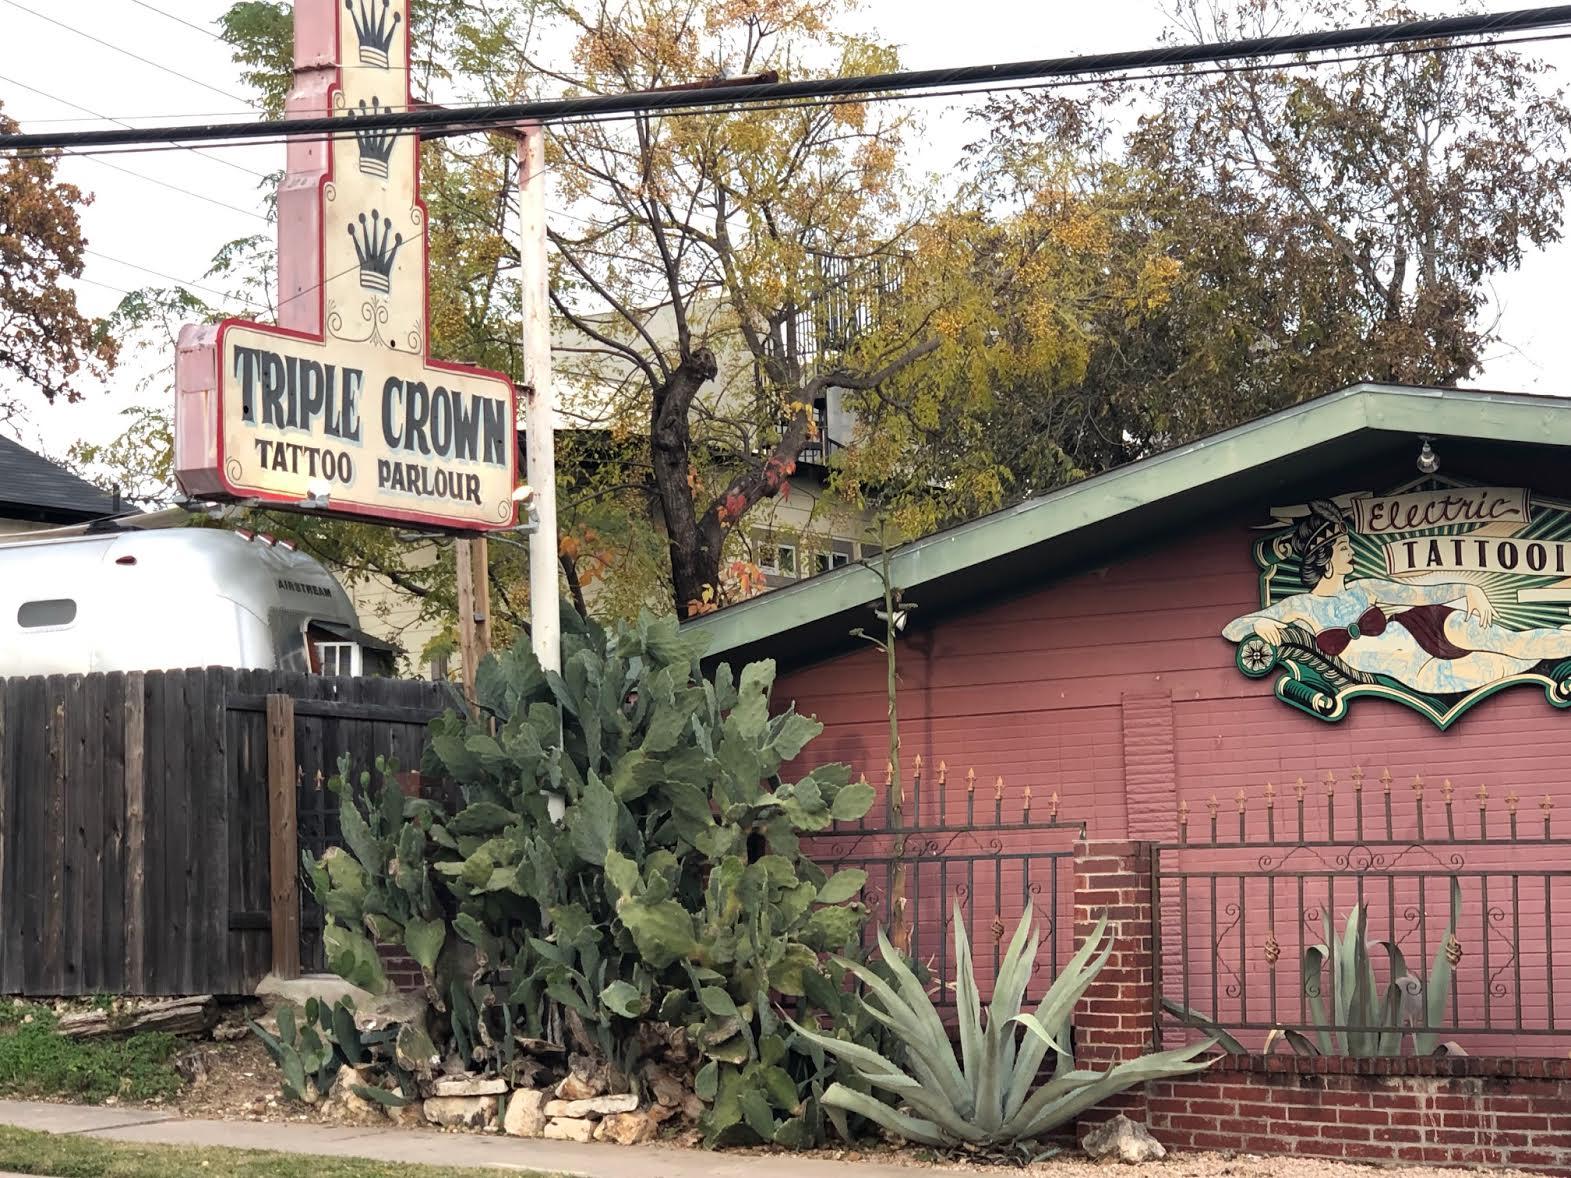 Austin, TX: Cacti, Airstreams & Tattoos, oh my!!!